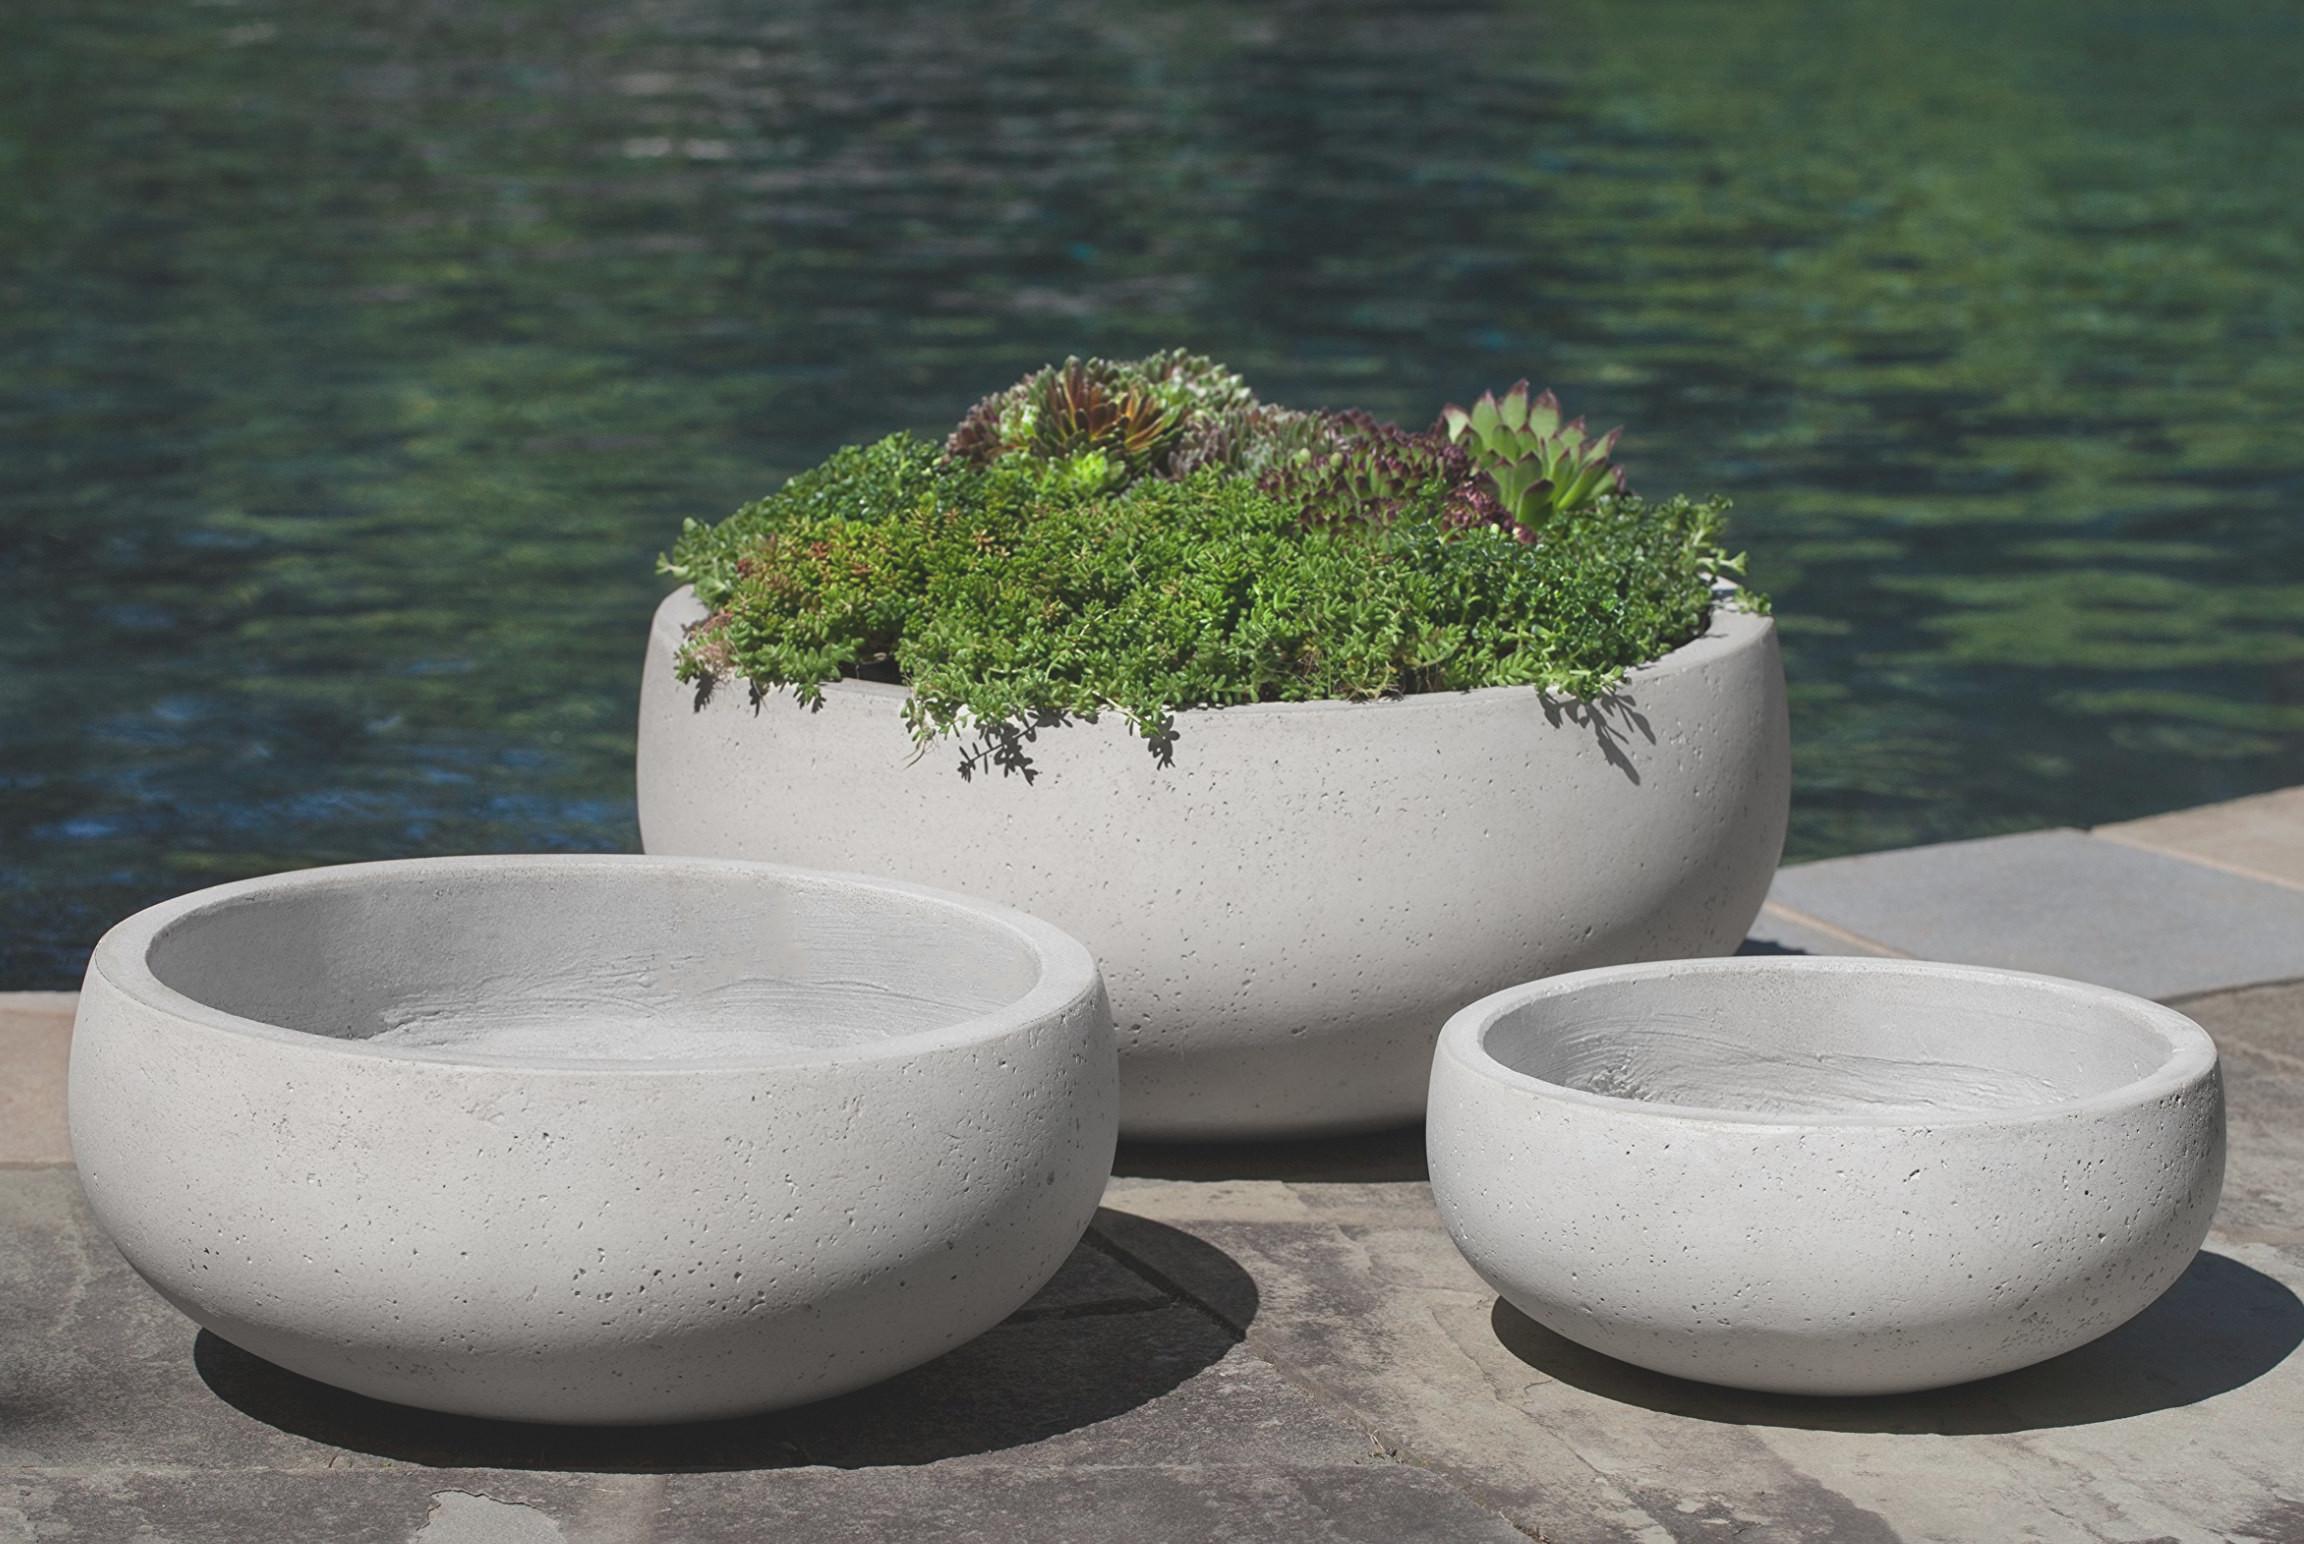 Large Round Rio Bowl Minimalist Gray Outdoor Concrete Garden Pots